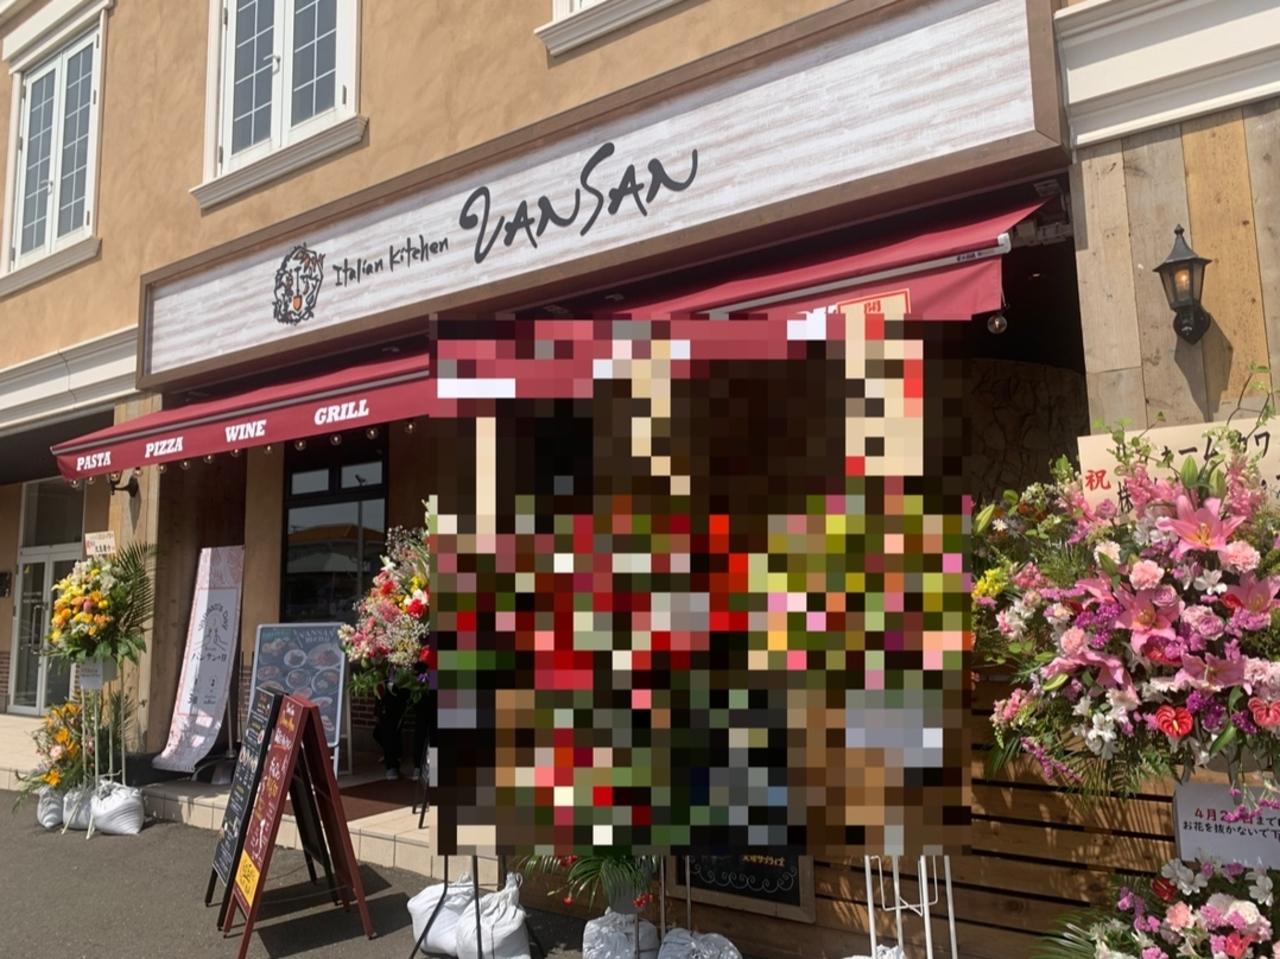 「Italian Kitchen VANSAN」 八戸店 21.4.24オープンしました!